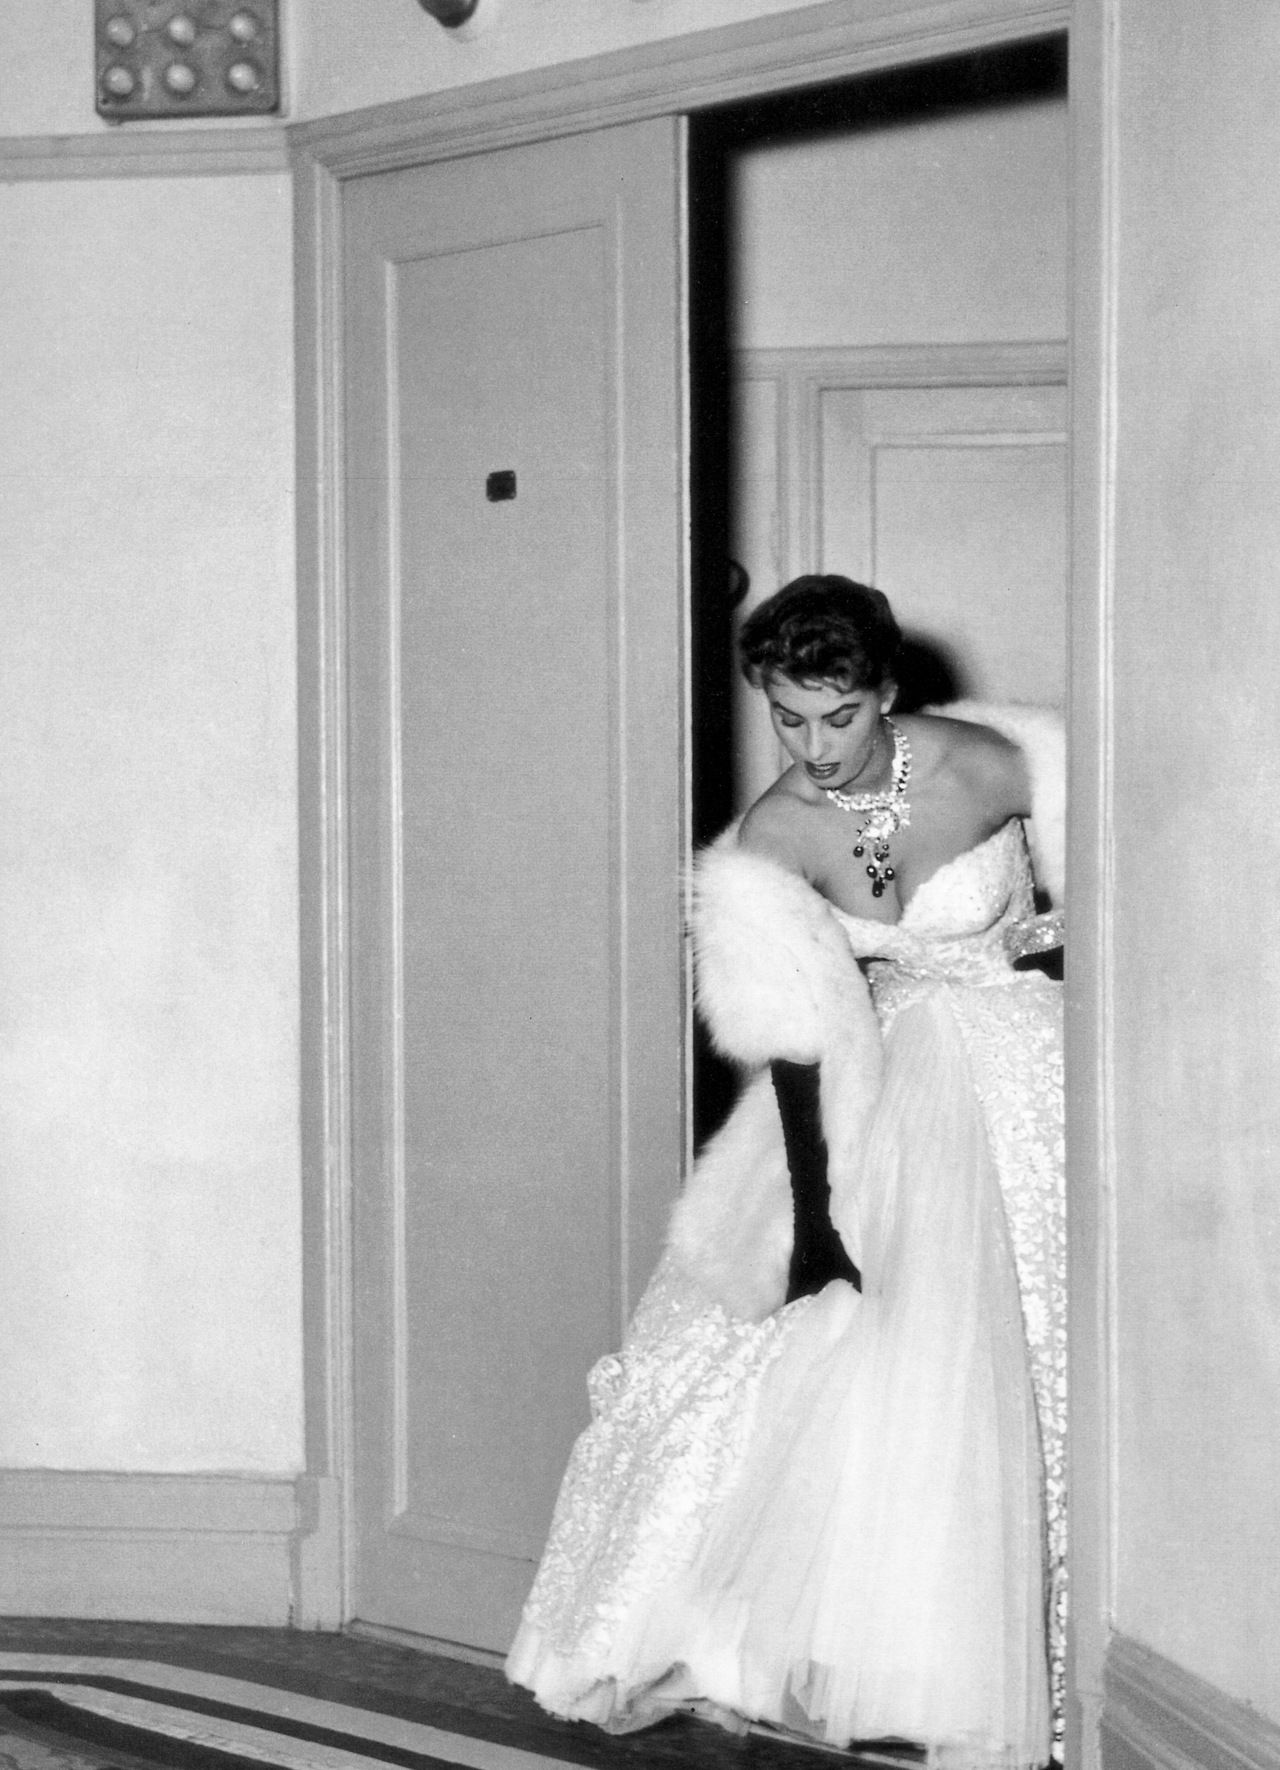 Sophia Loren at the Carlton Hotel photographed by Edward Quinn, 1955